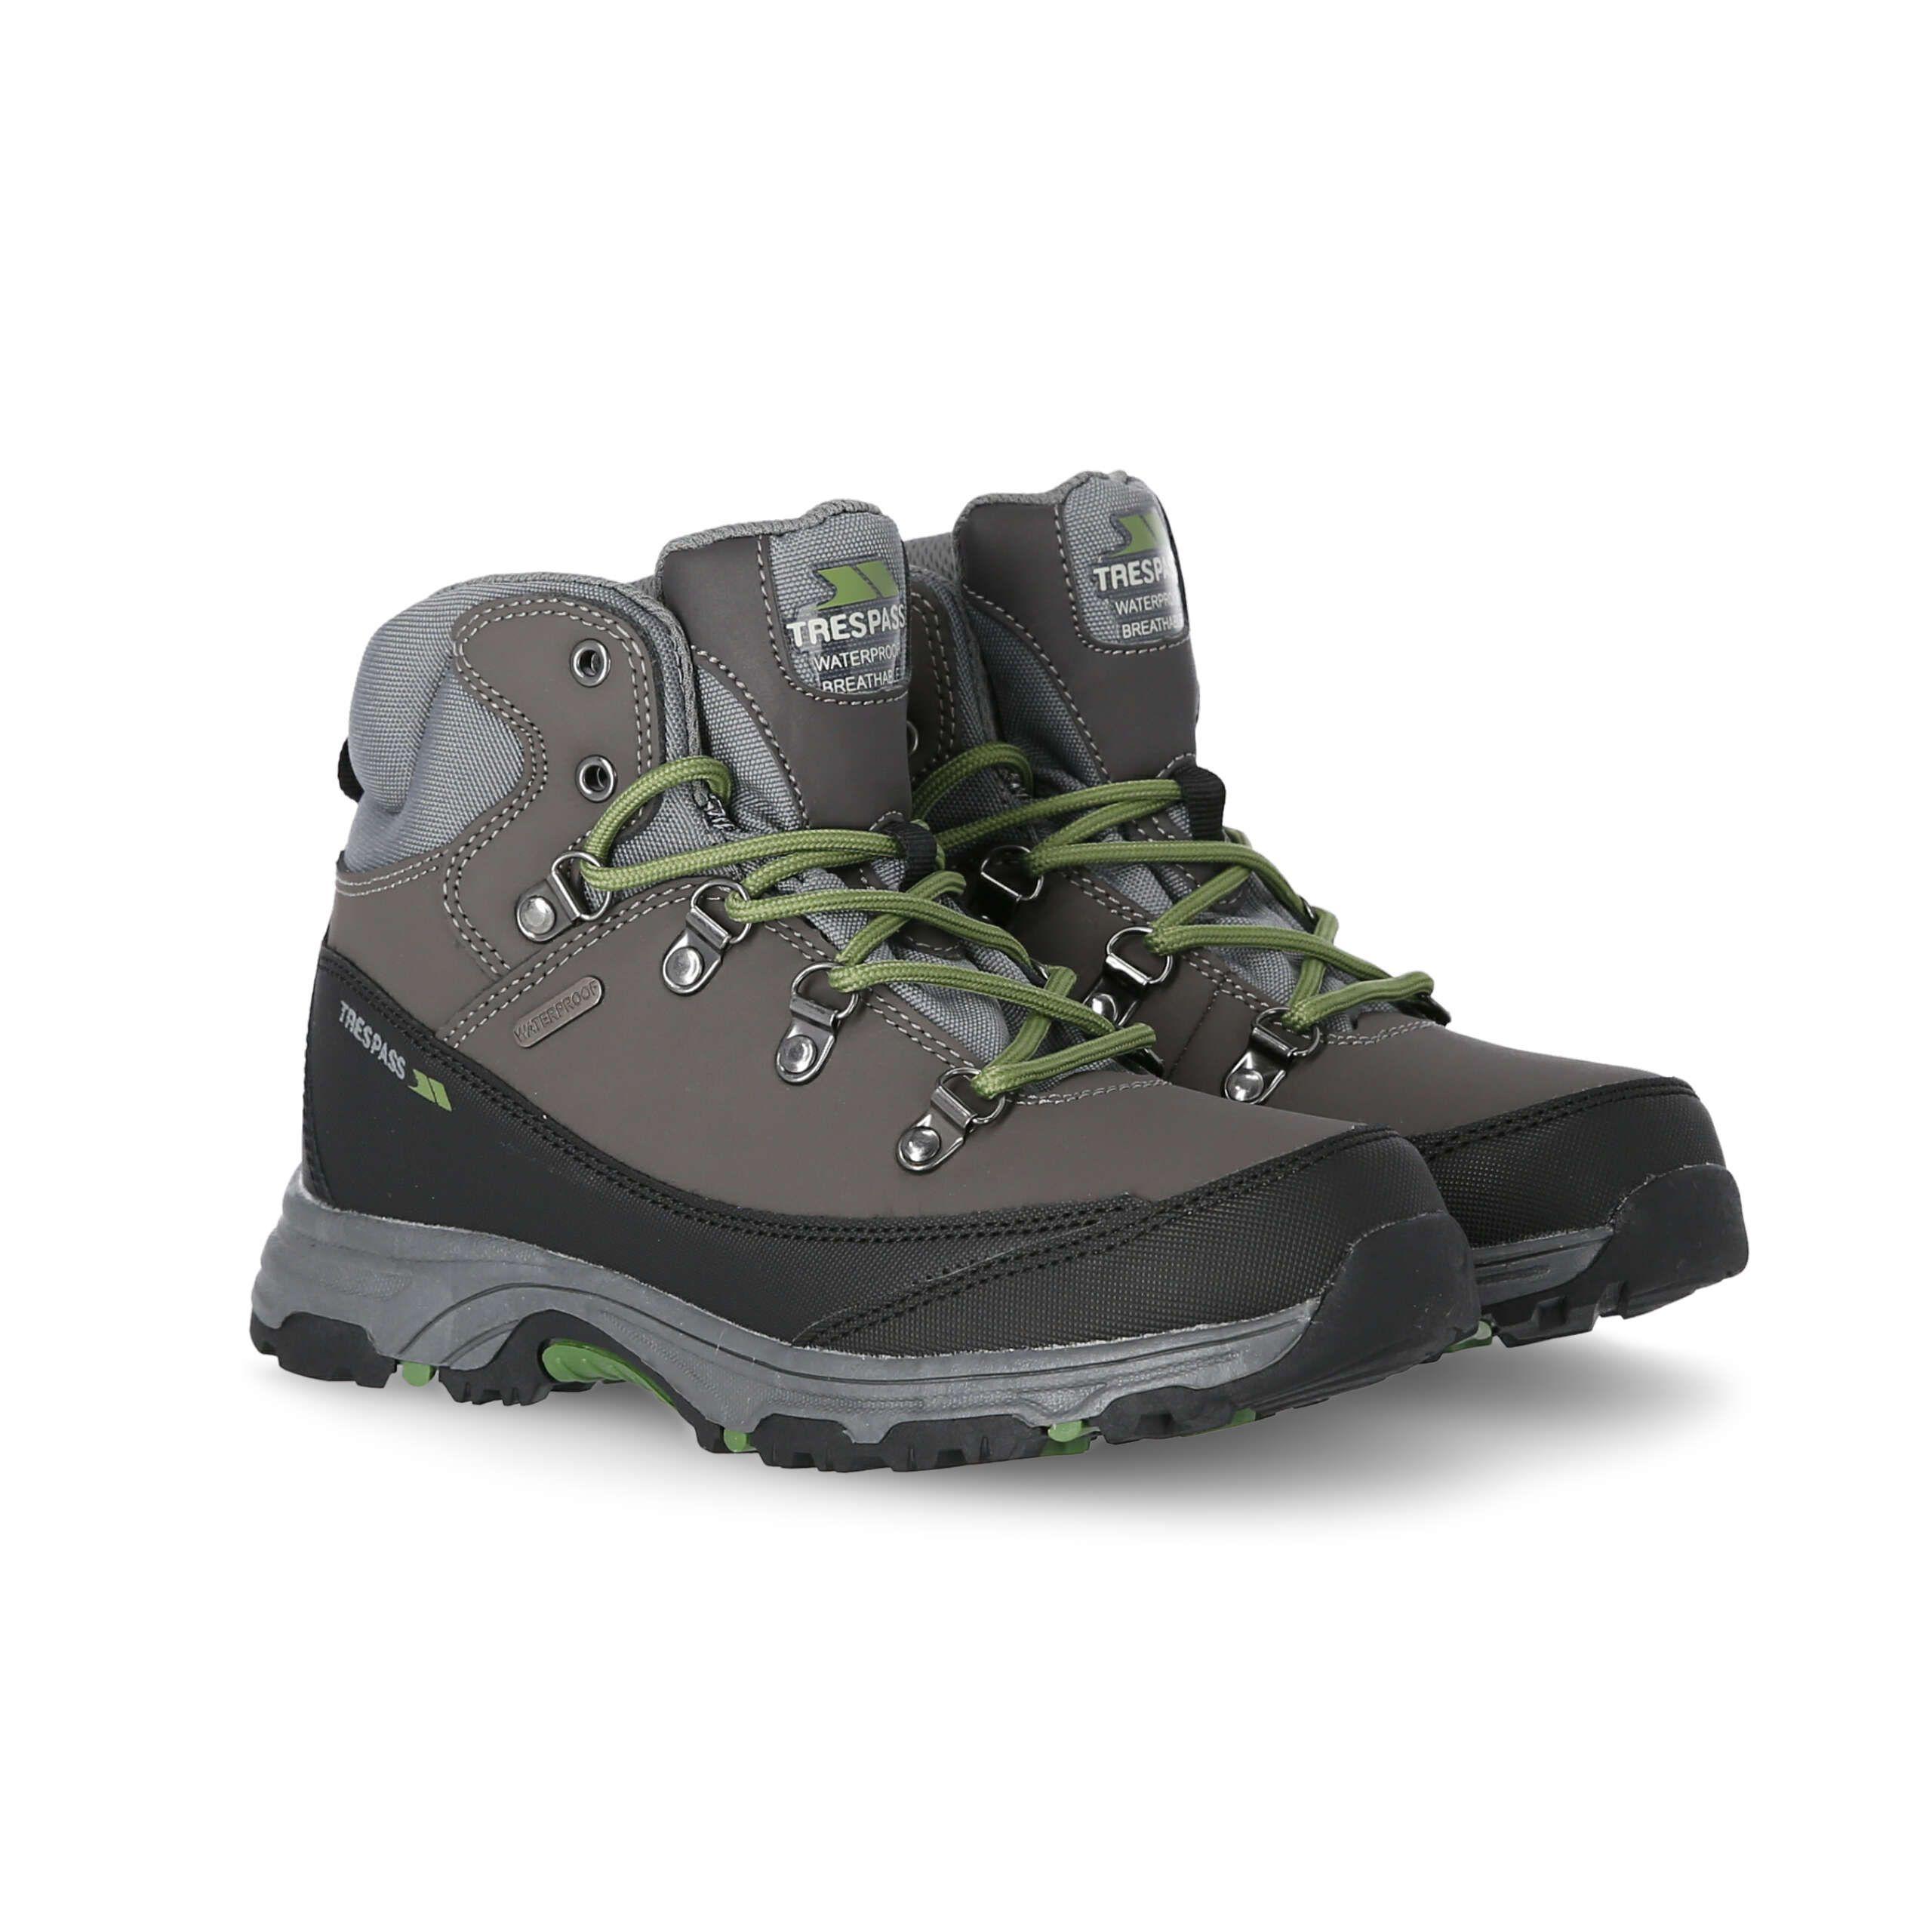 Trespass Youth Glebe Ii Walking Boots